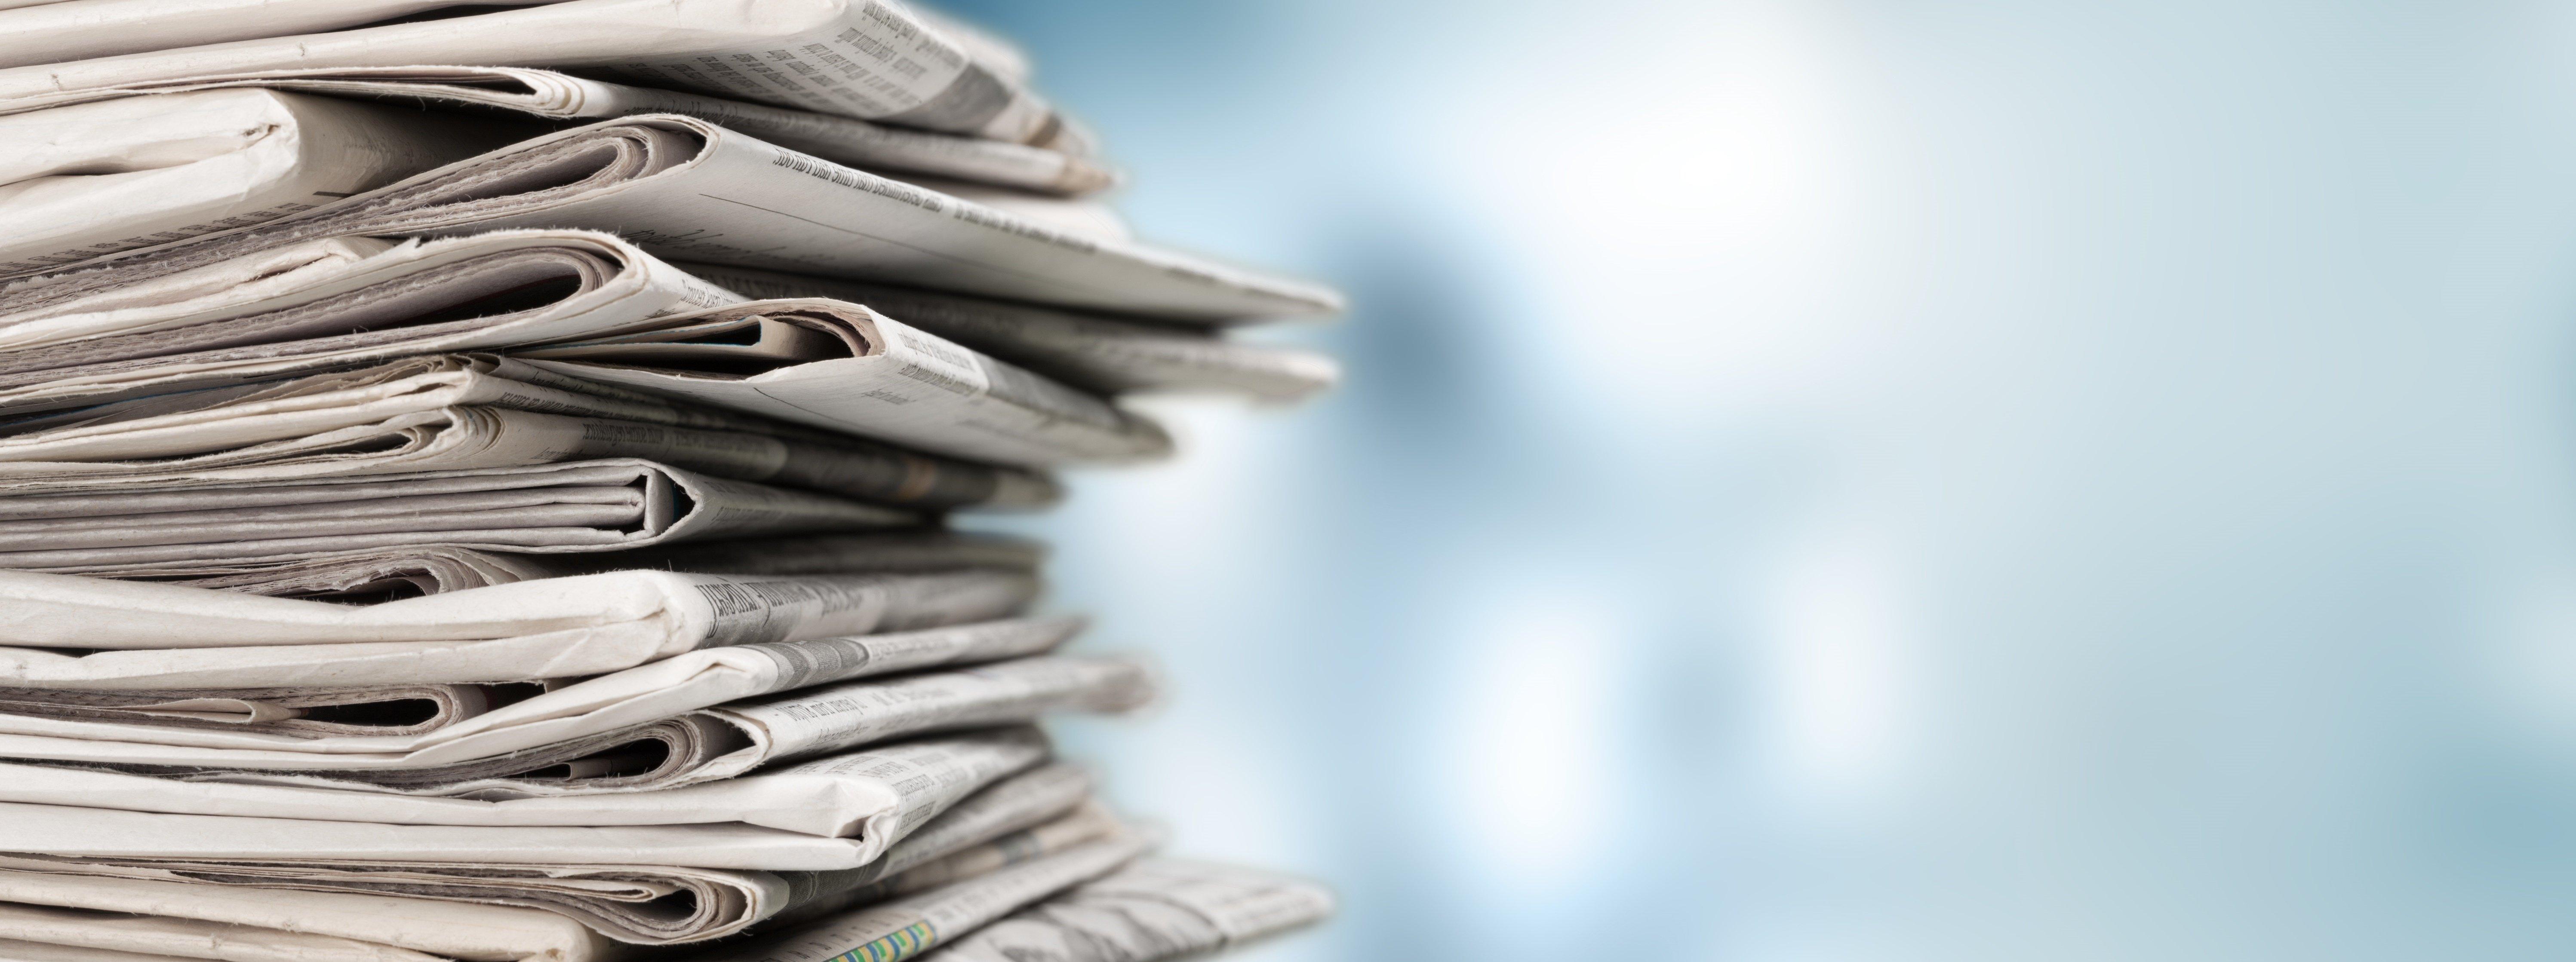 Publishing subscriptions